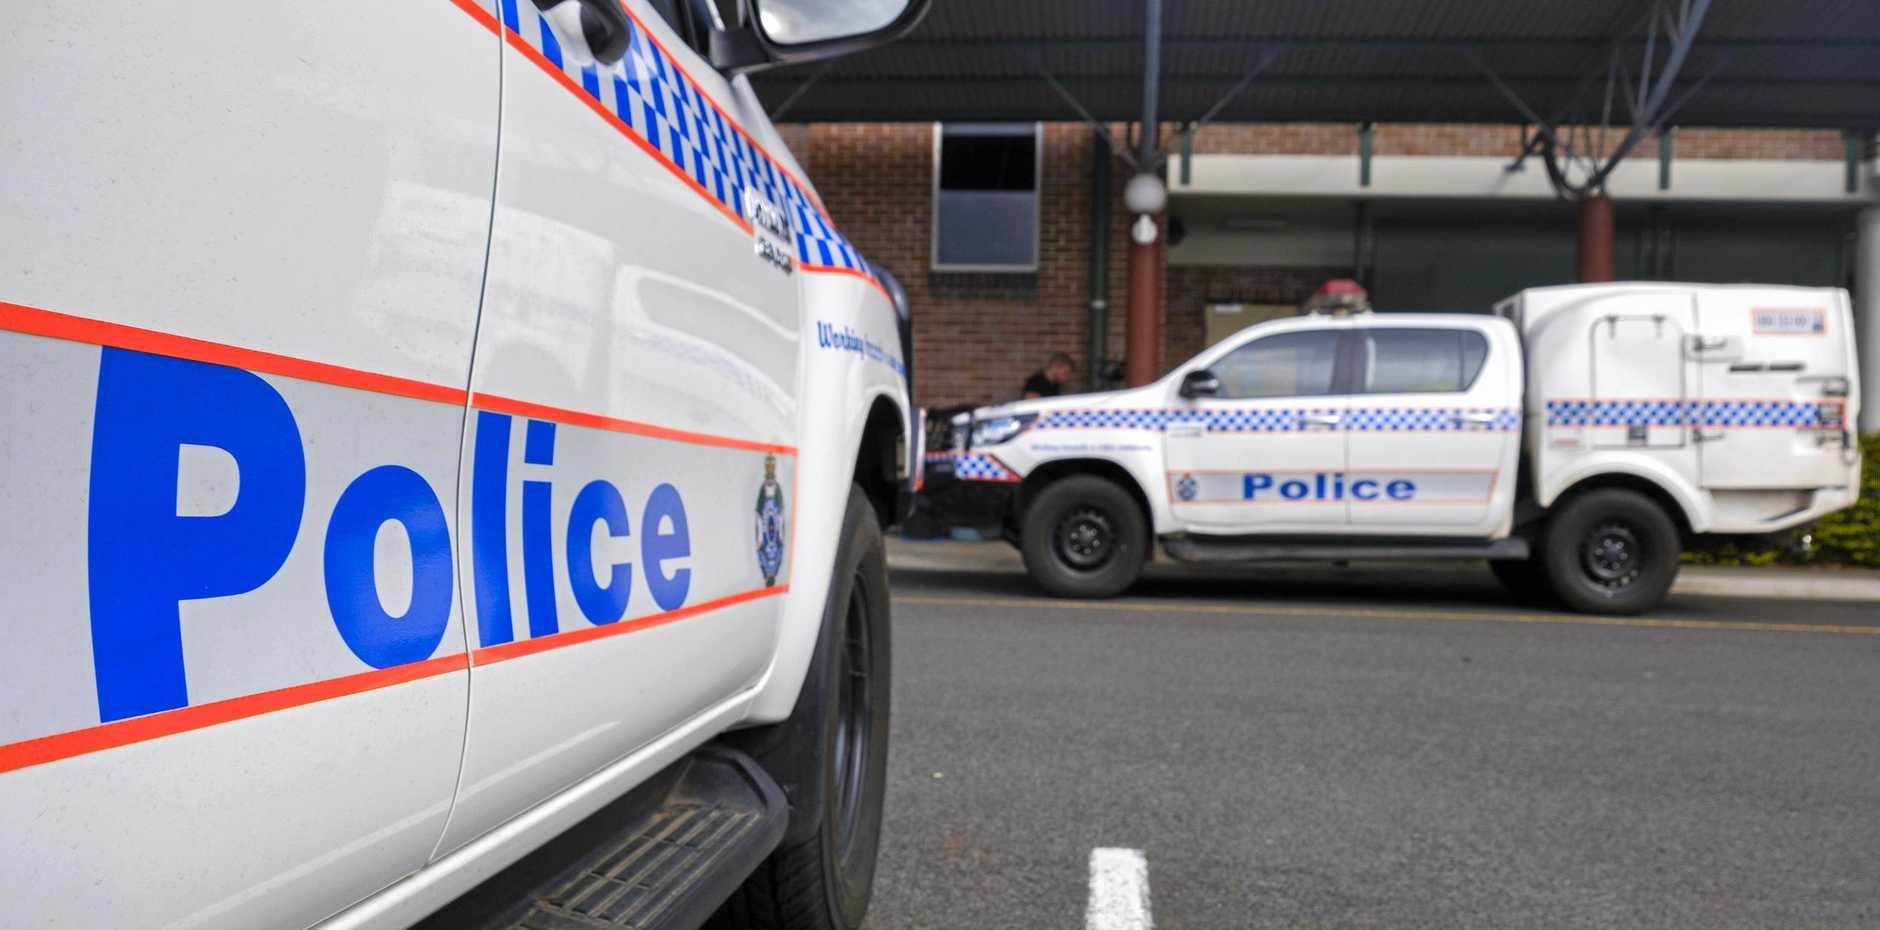 Police were on scene of a fatal light plane crash in South Australia.